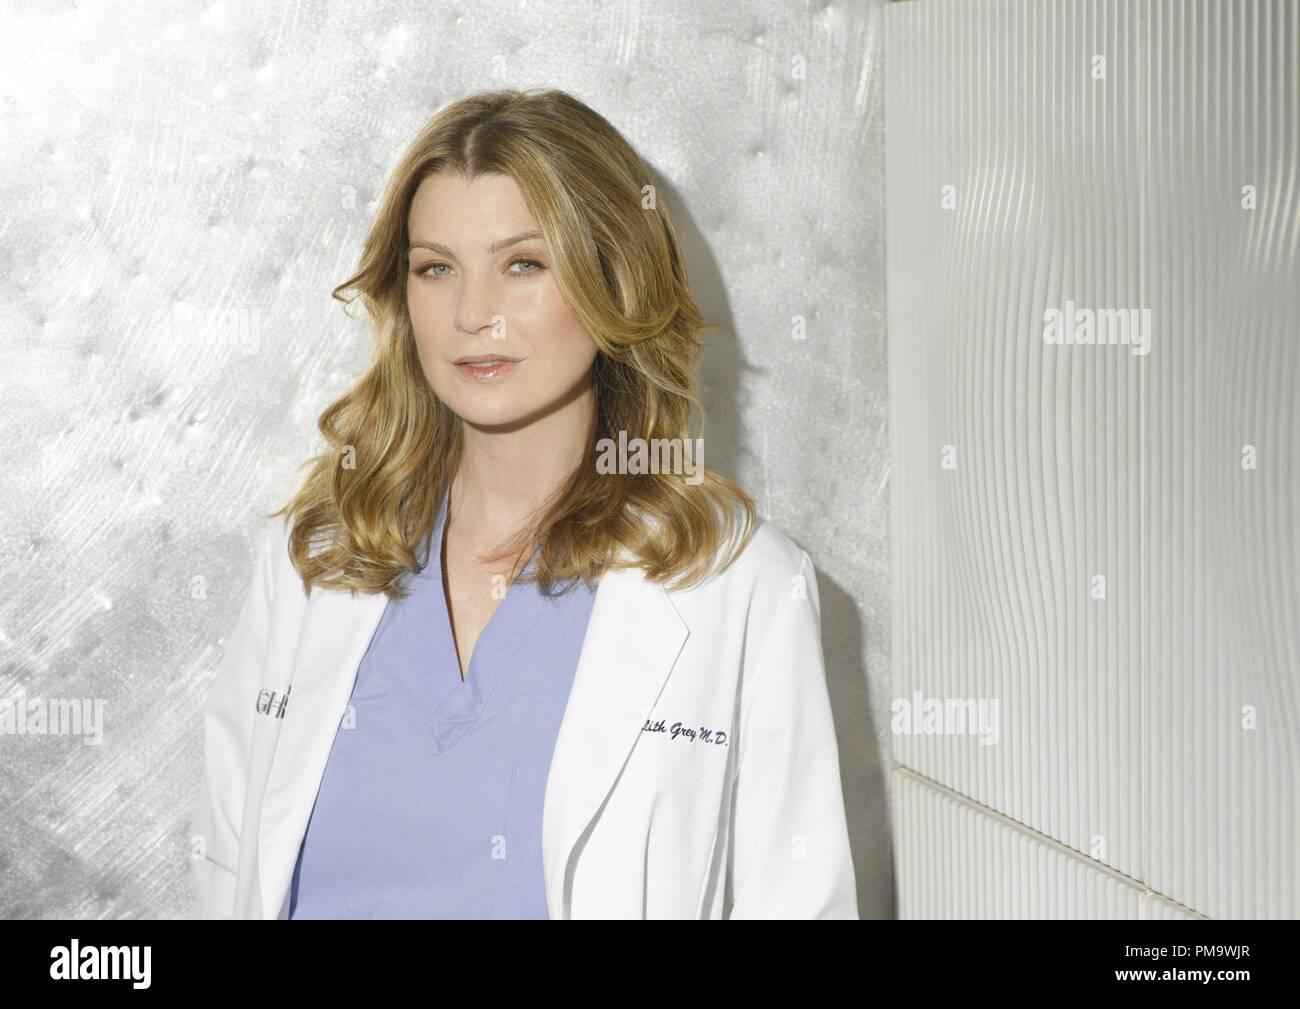 Meredith Grey Imágenes De Stock & Meredith Grey Fotos De Stock - Alamy